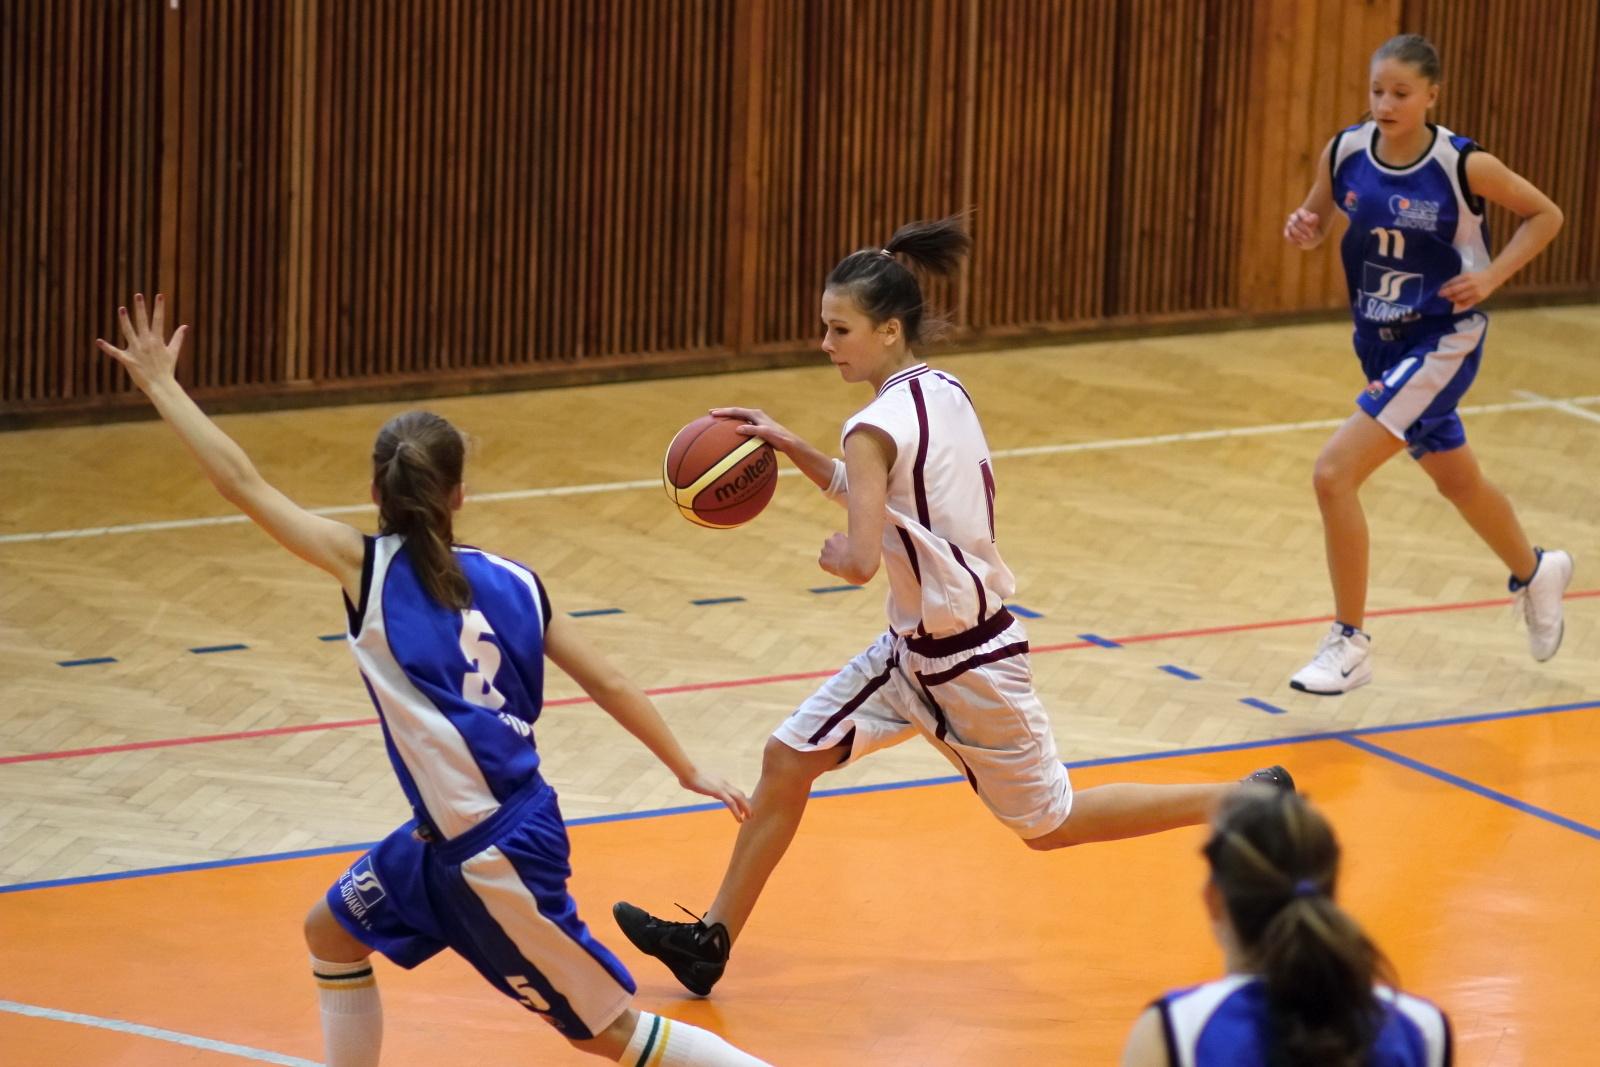 bk-zvolen-abovia-kosice-ziacky-basketbal-2011-14